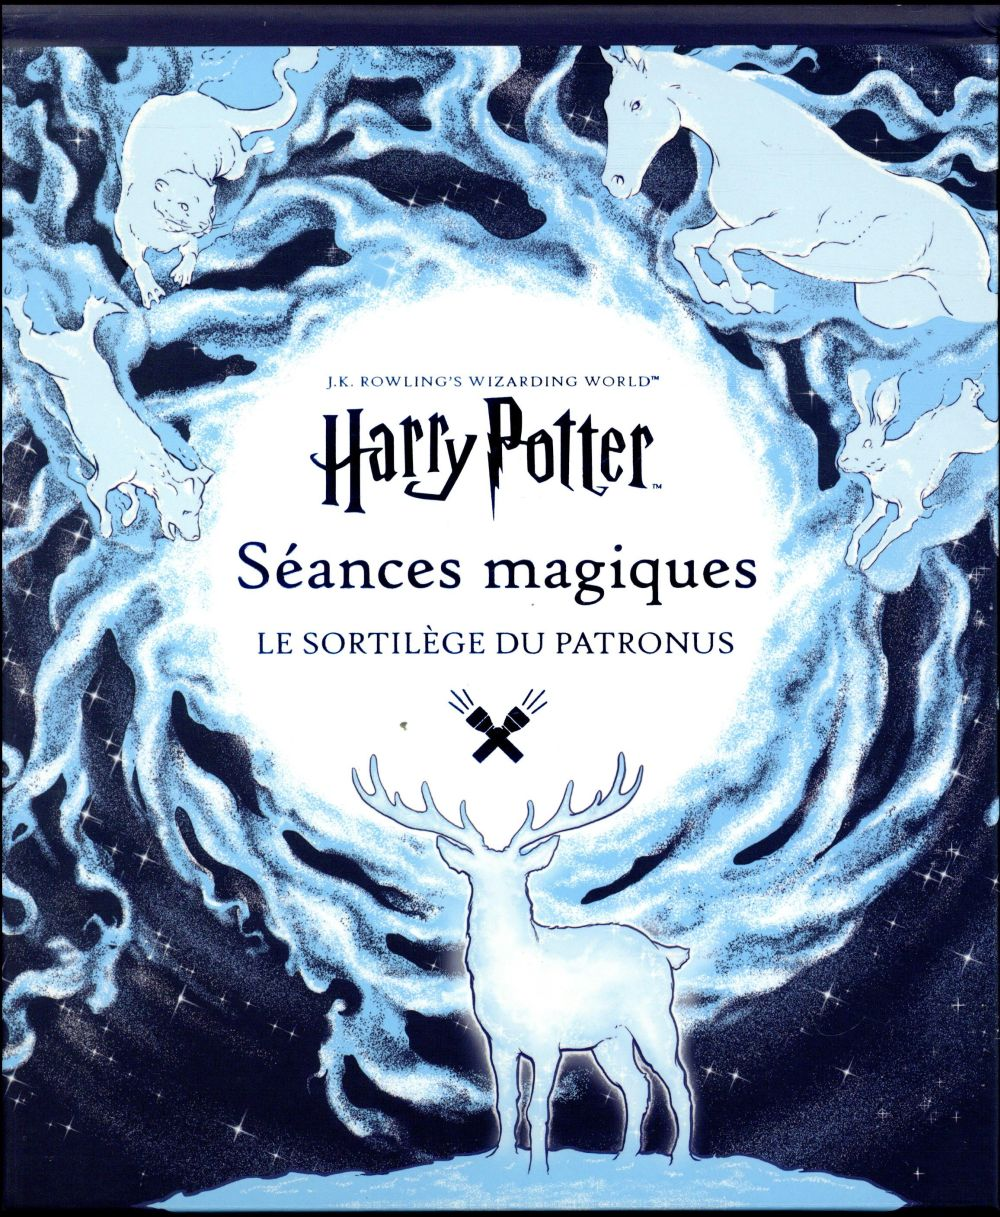 J.K. ROWLING'S WIZARDING WORLD : SEANCES MAGIQUES